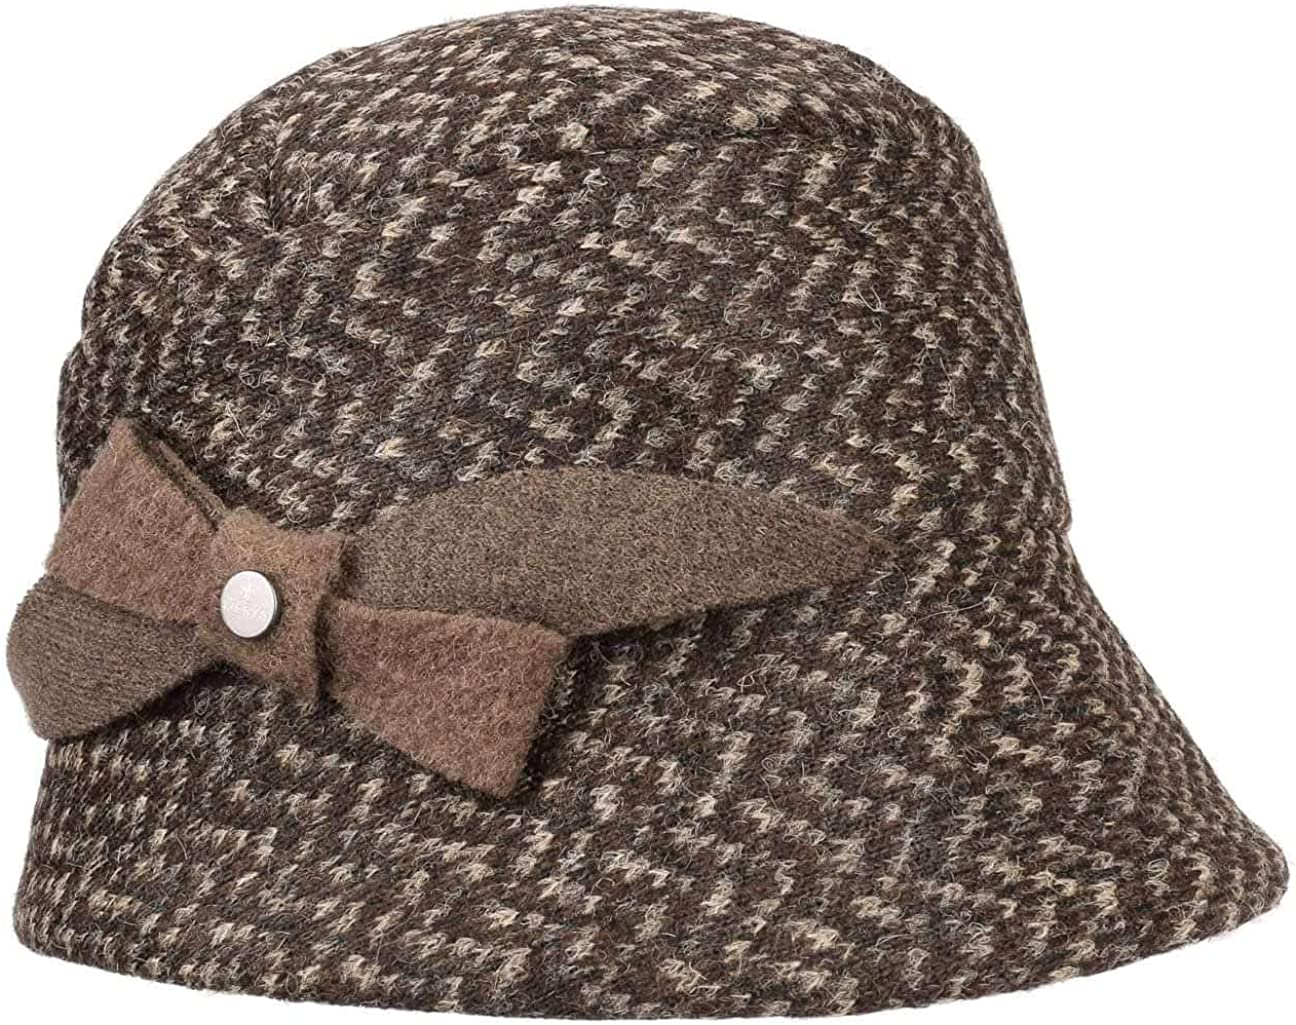 Lierys Gold Harris Tweed Damenhut mit Kaschmir Wollhut Winterhut Glockenhut Damen Futter Herbst-Winter Made in Italy Futter